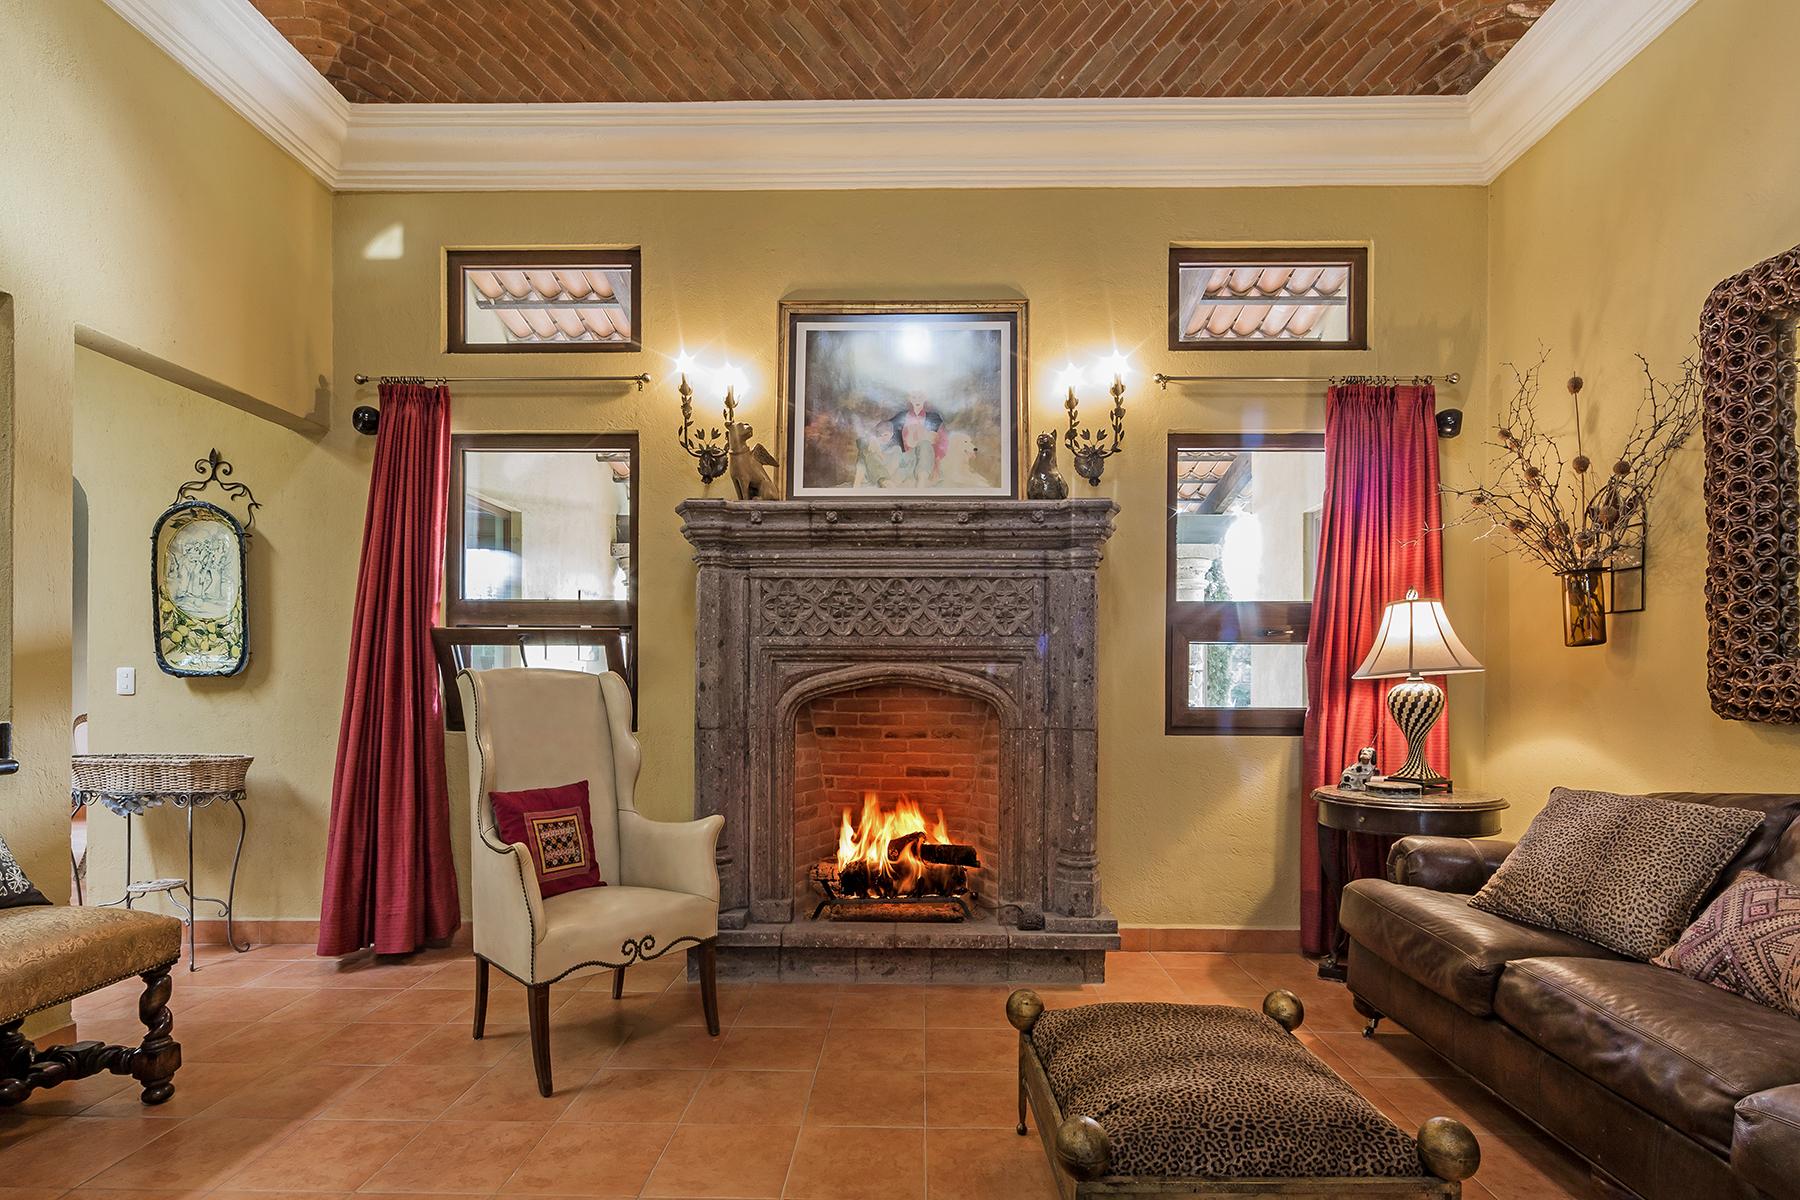 Additional photo for property listing at Casa Tinka Los Labradores, San Miguel De Allende, Guanajuato México